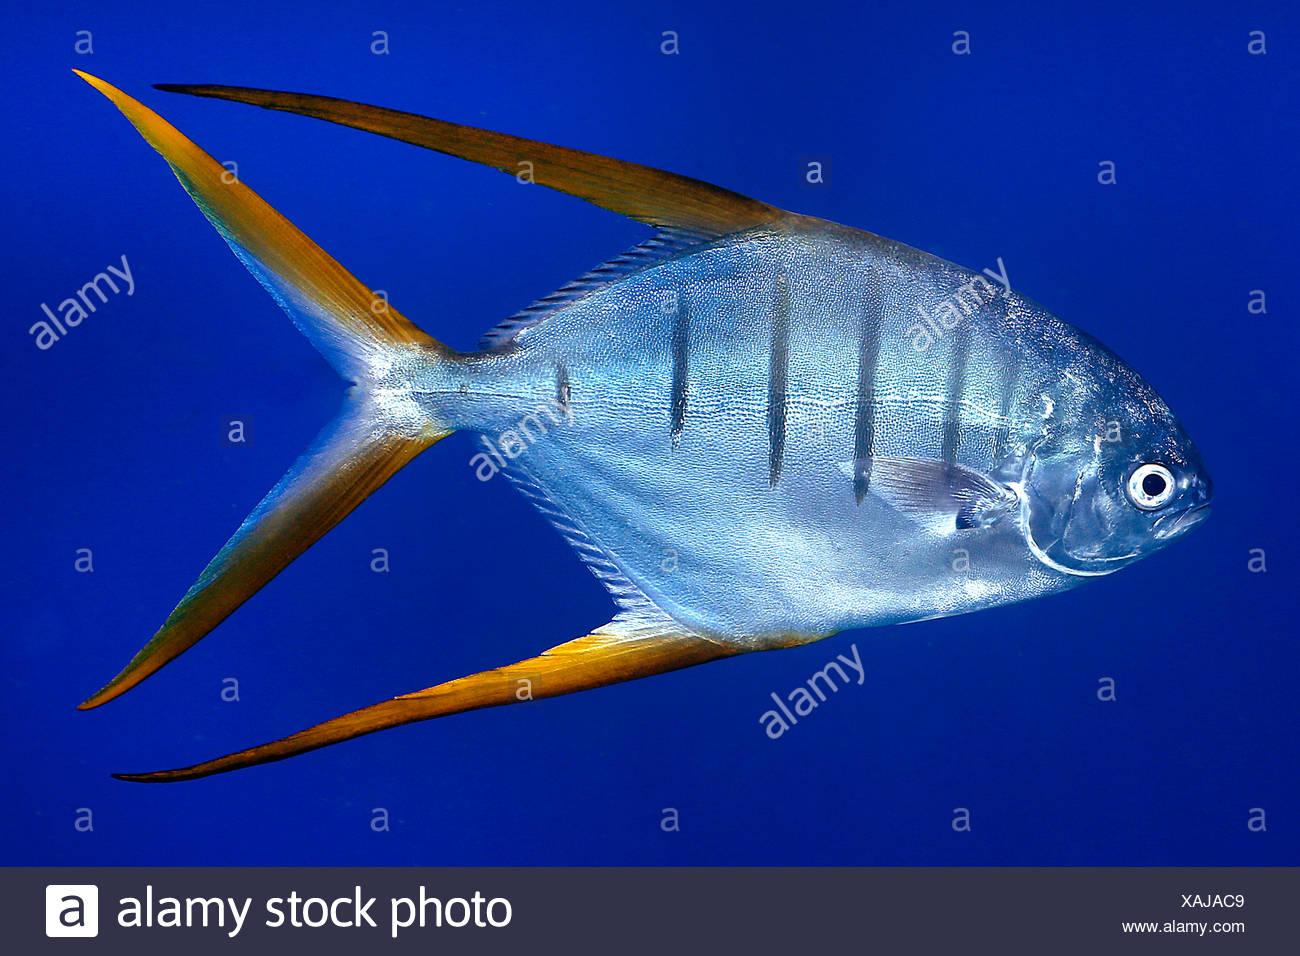 Stachelmakrele, Stachel-Makrele, Trachinotus rhodopus (Trachinotus rhodopus), schwimmend, Costa Rica | Gafftopsail pompano (Trac - Stock Image